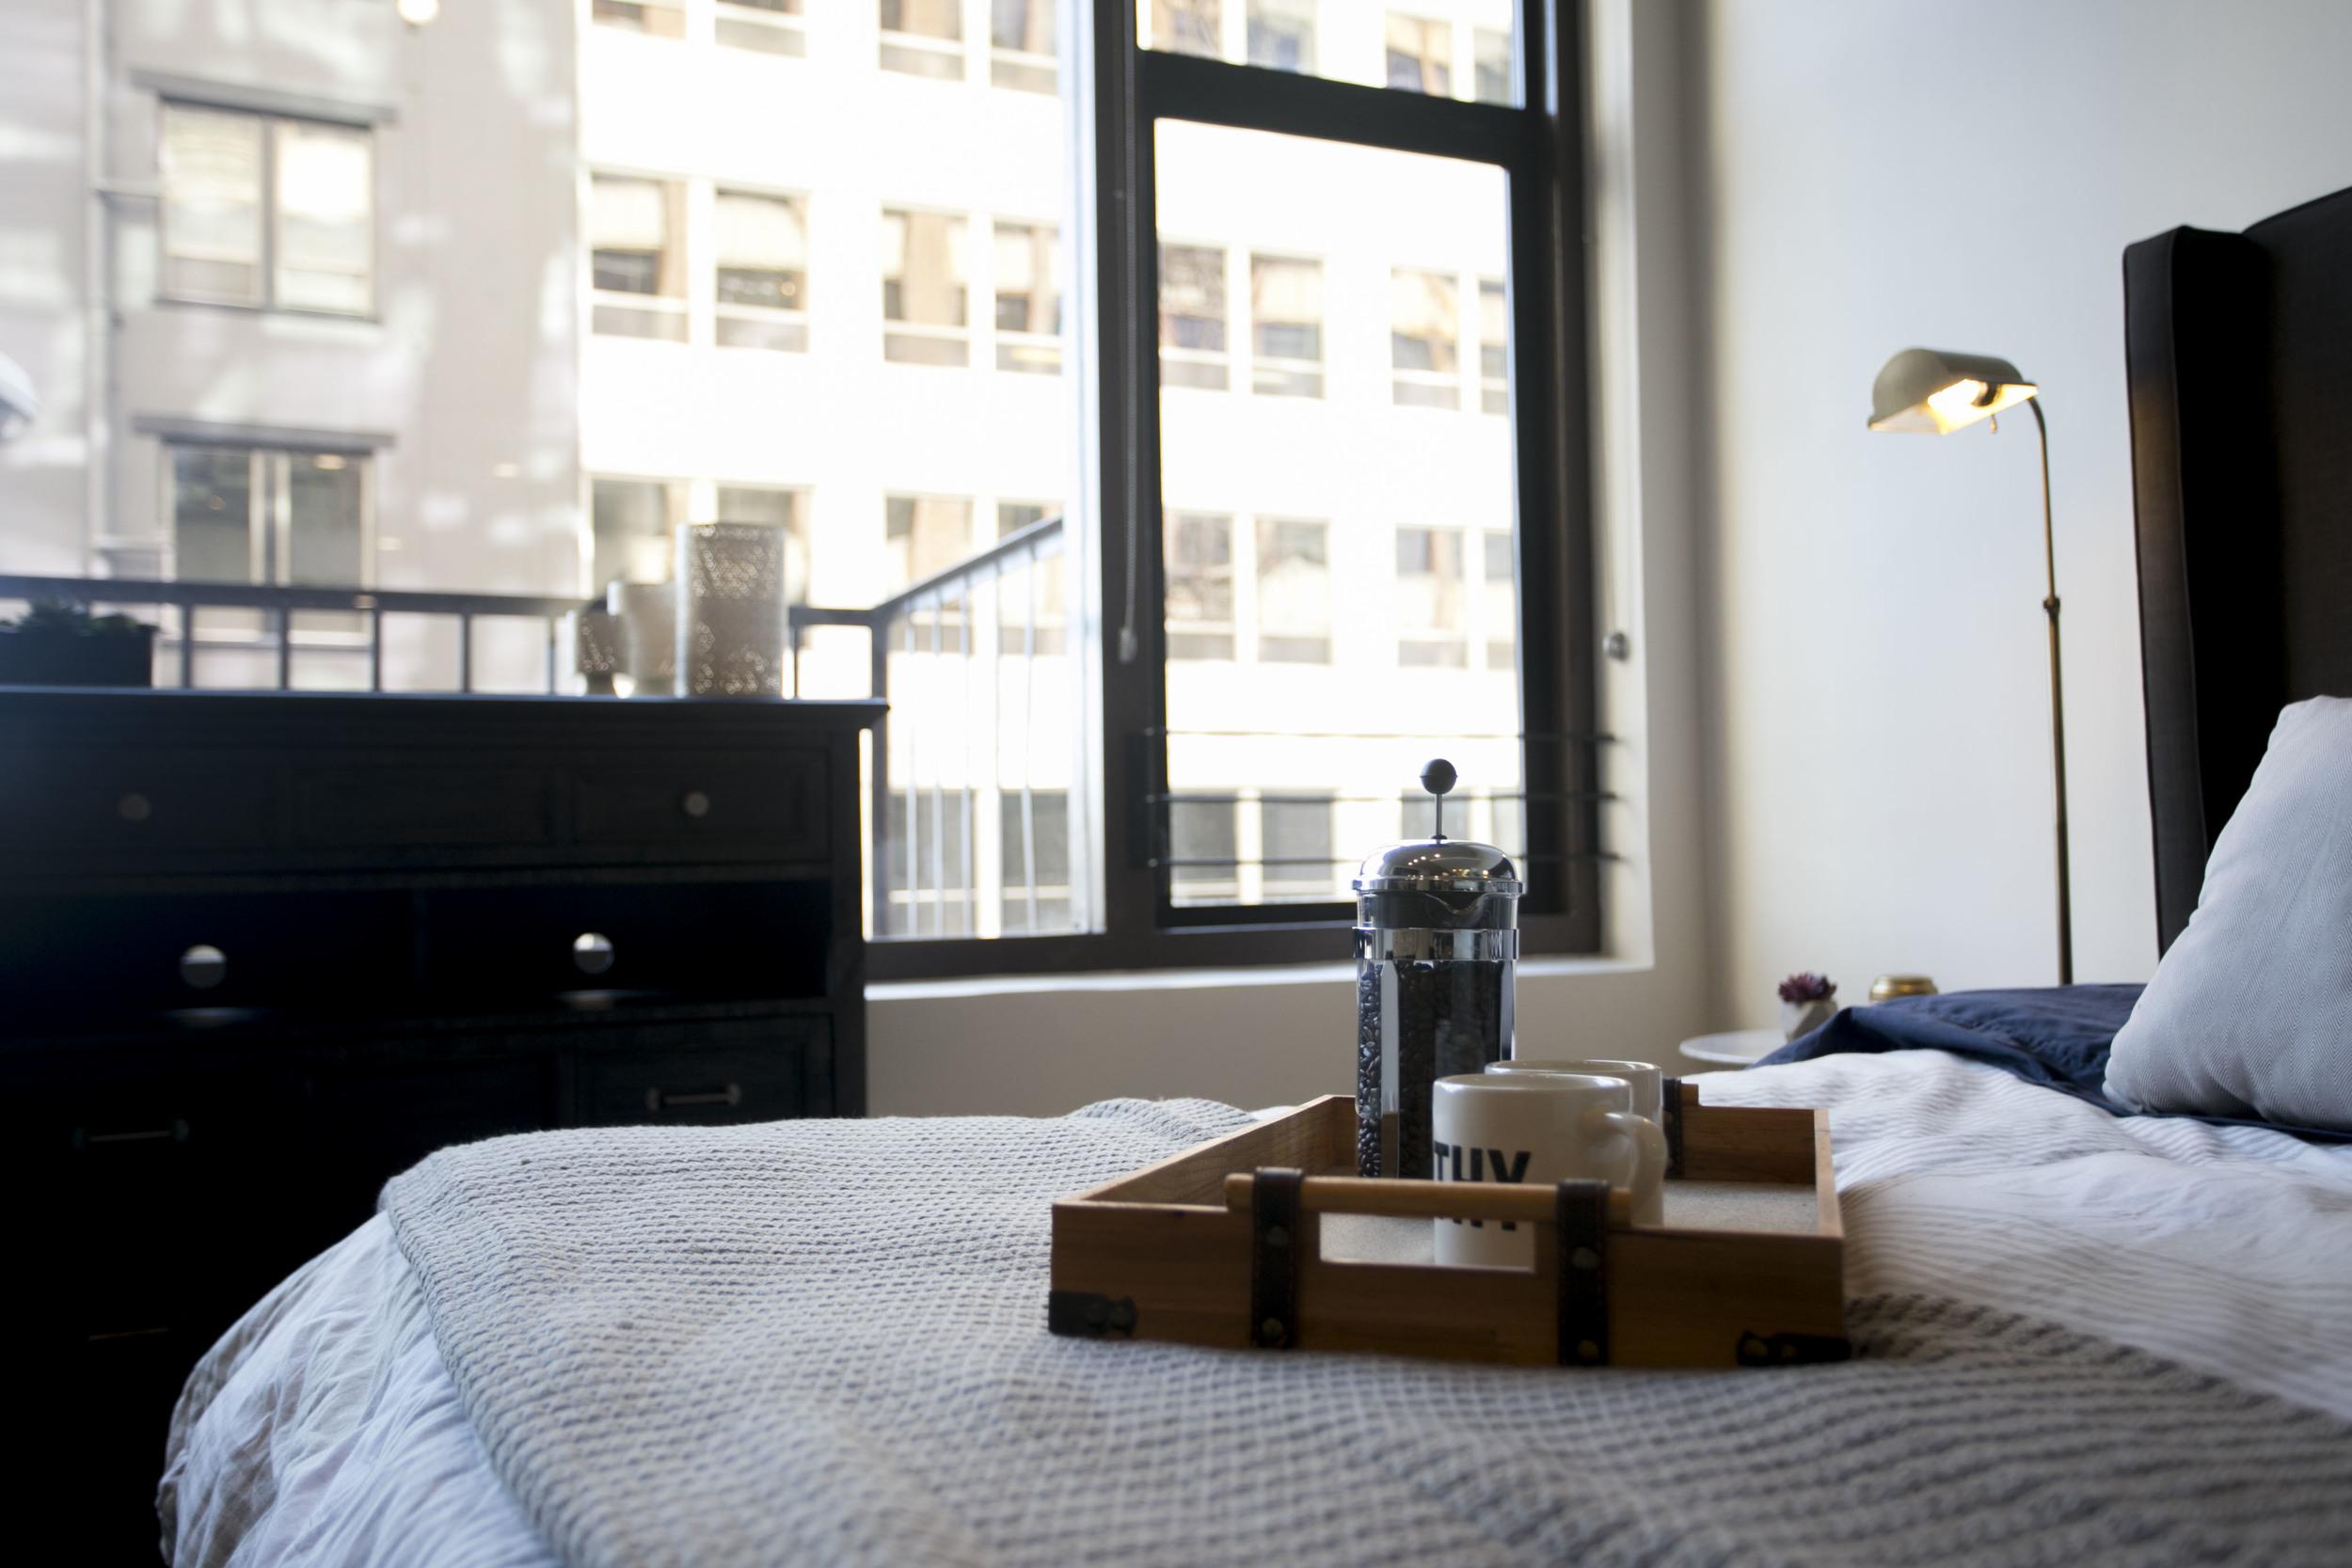 Bedroom at Garment Lofts